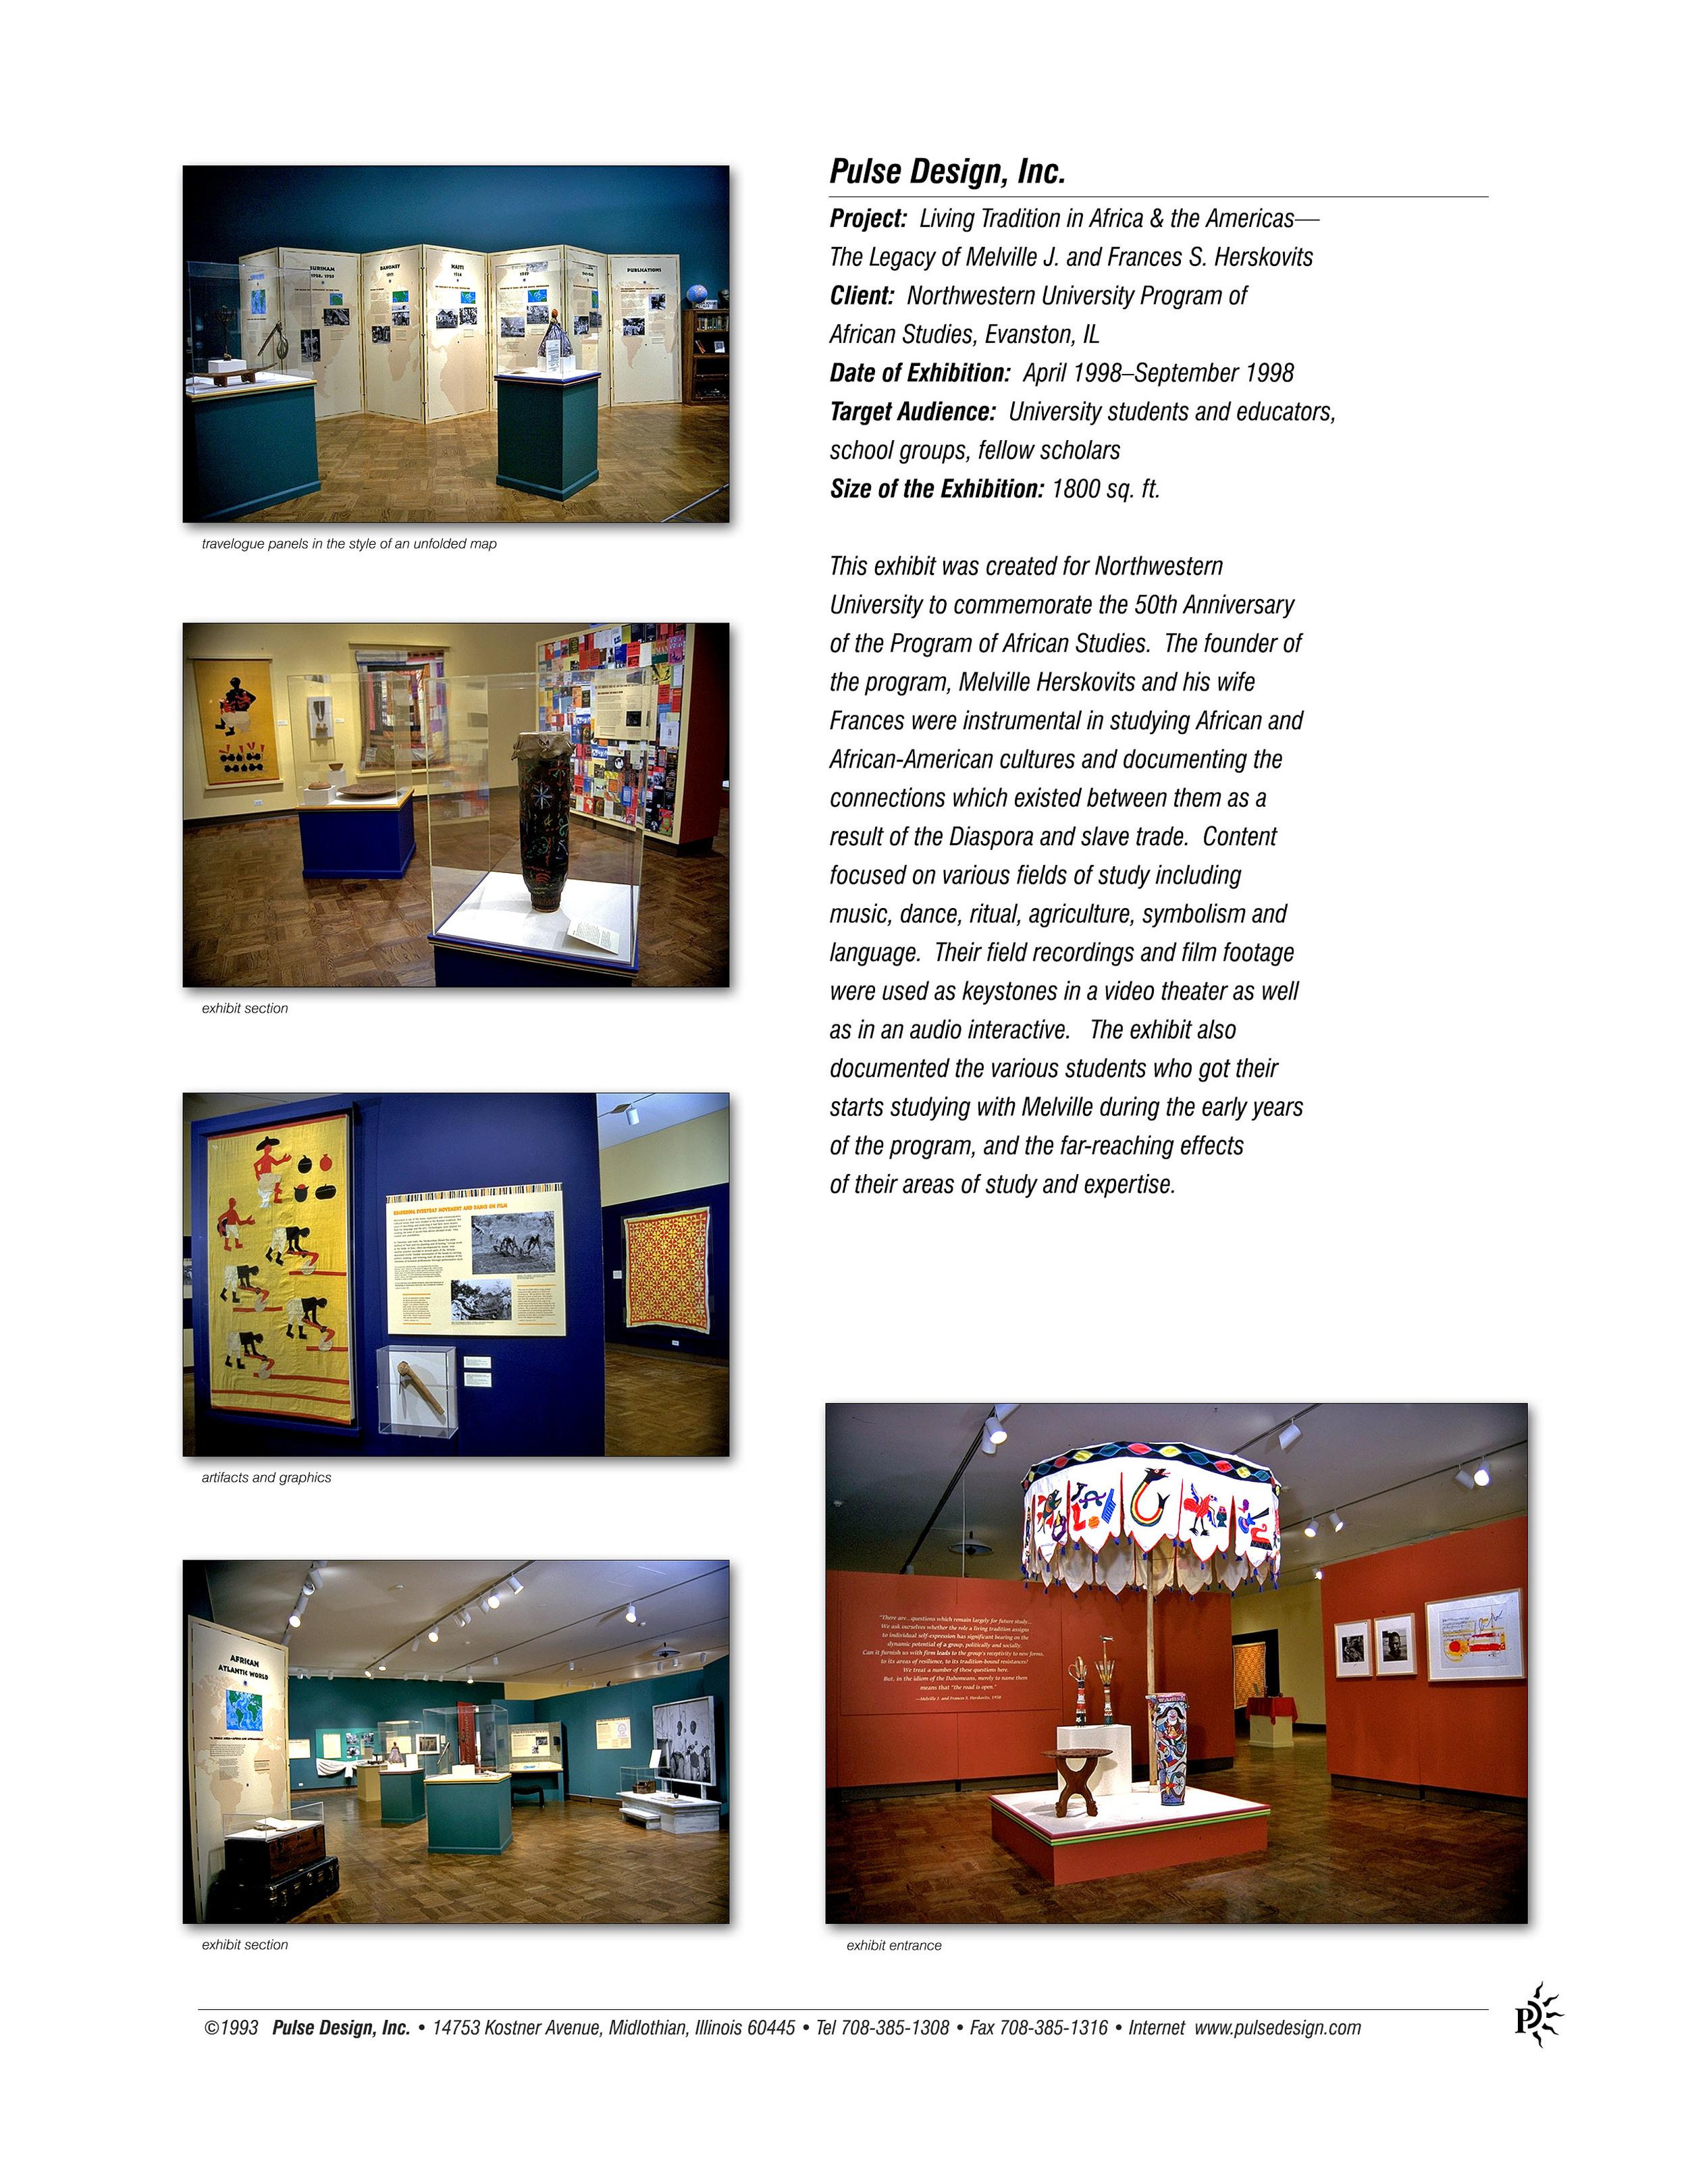 Herskovits-Exhibit-Pulse-Design-Inc.jpg